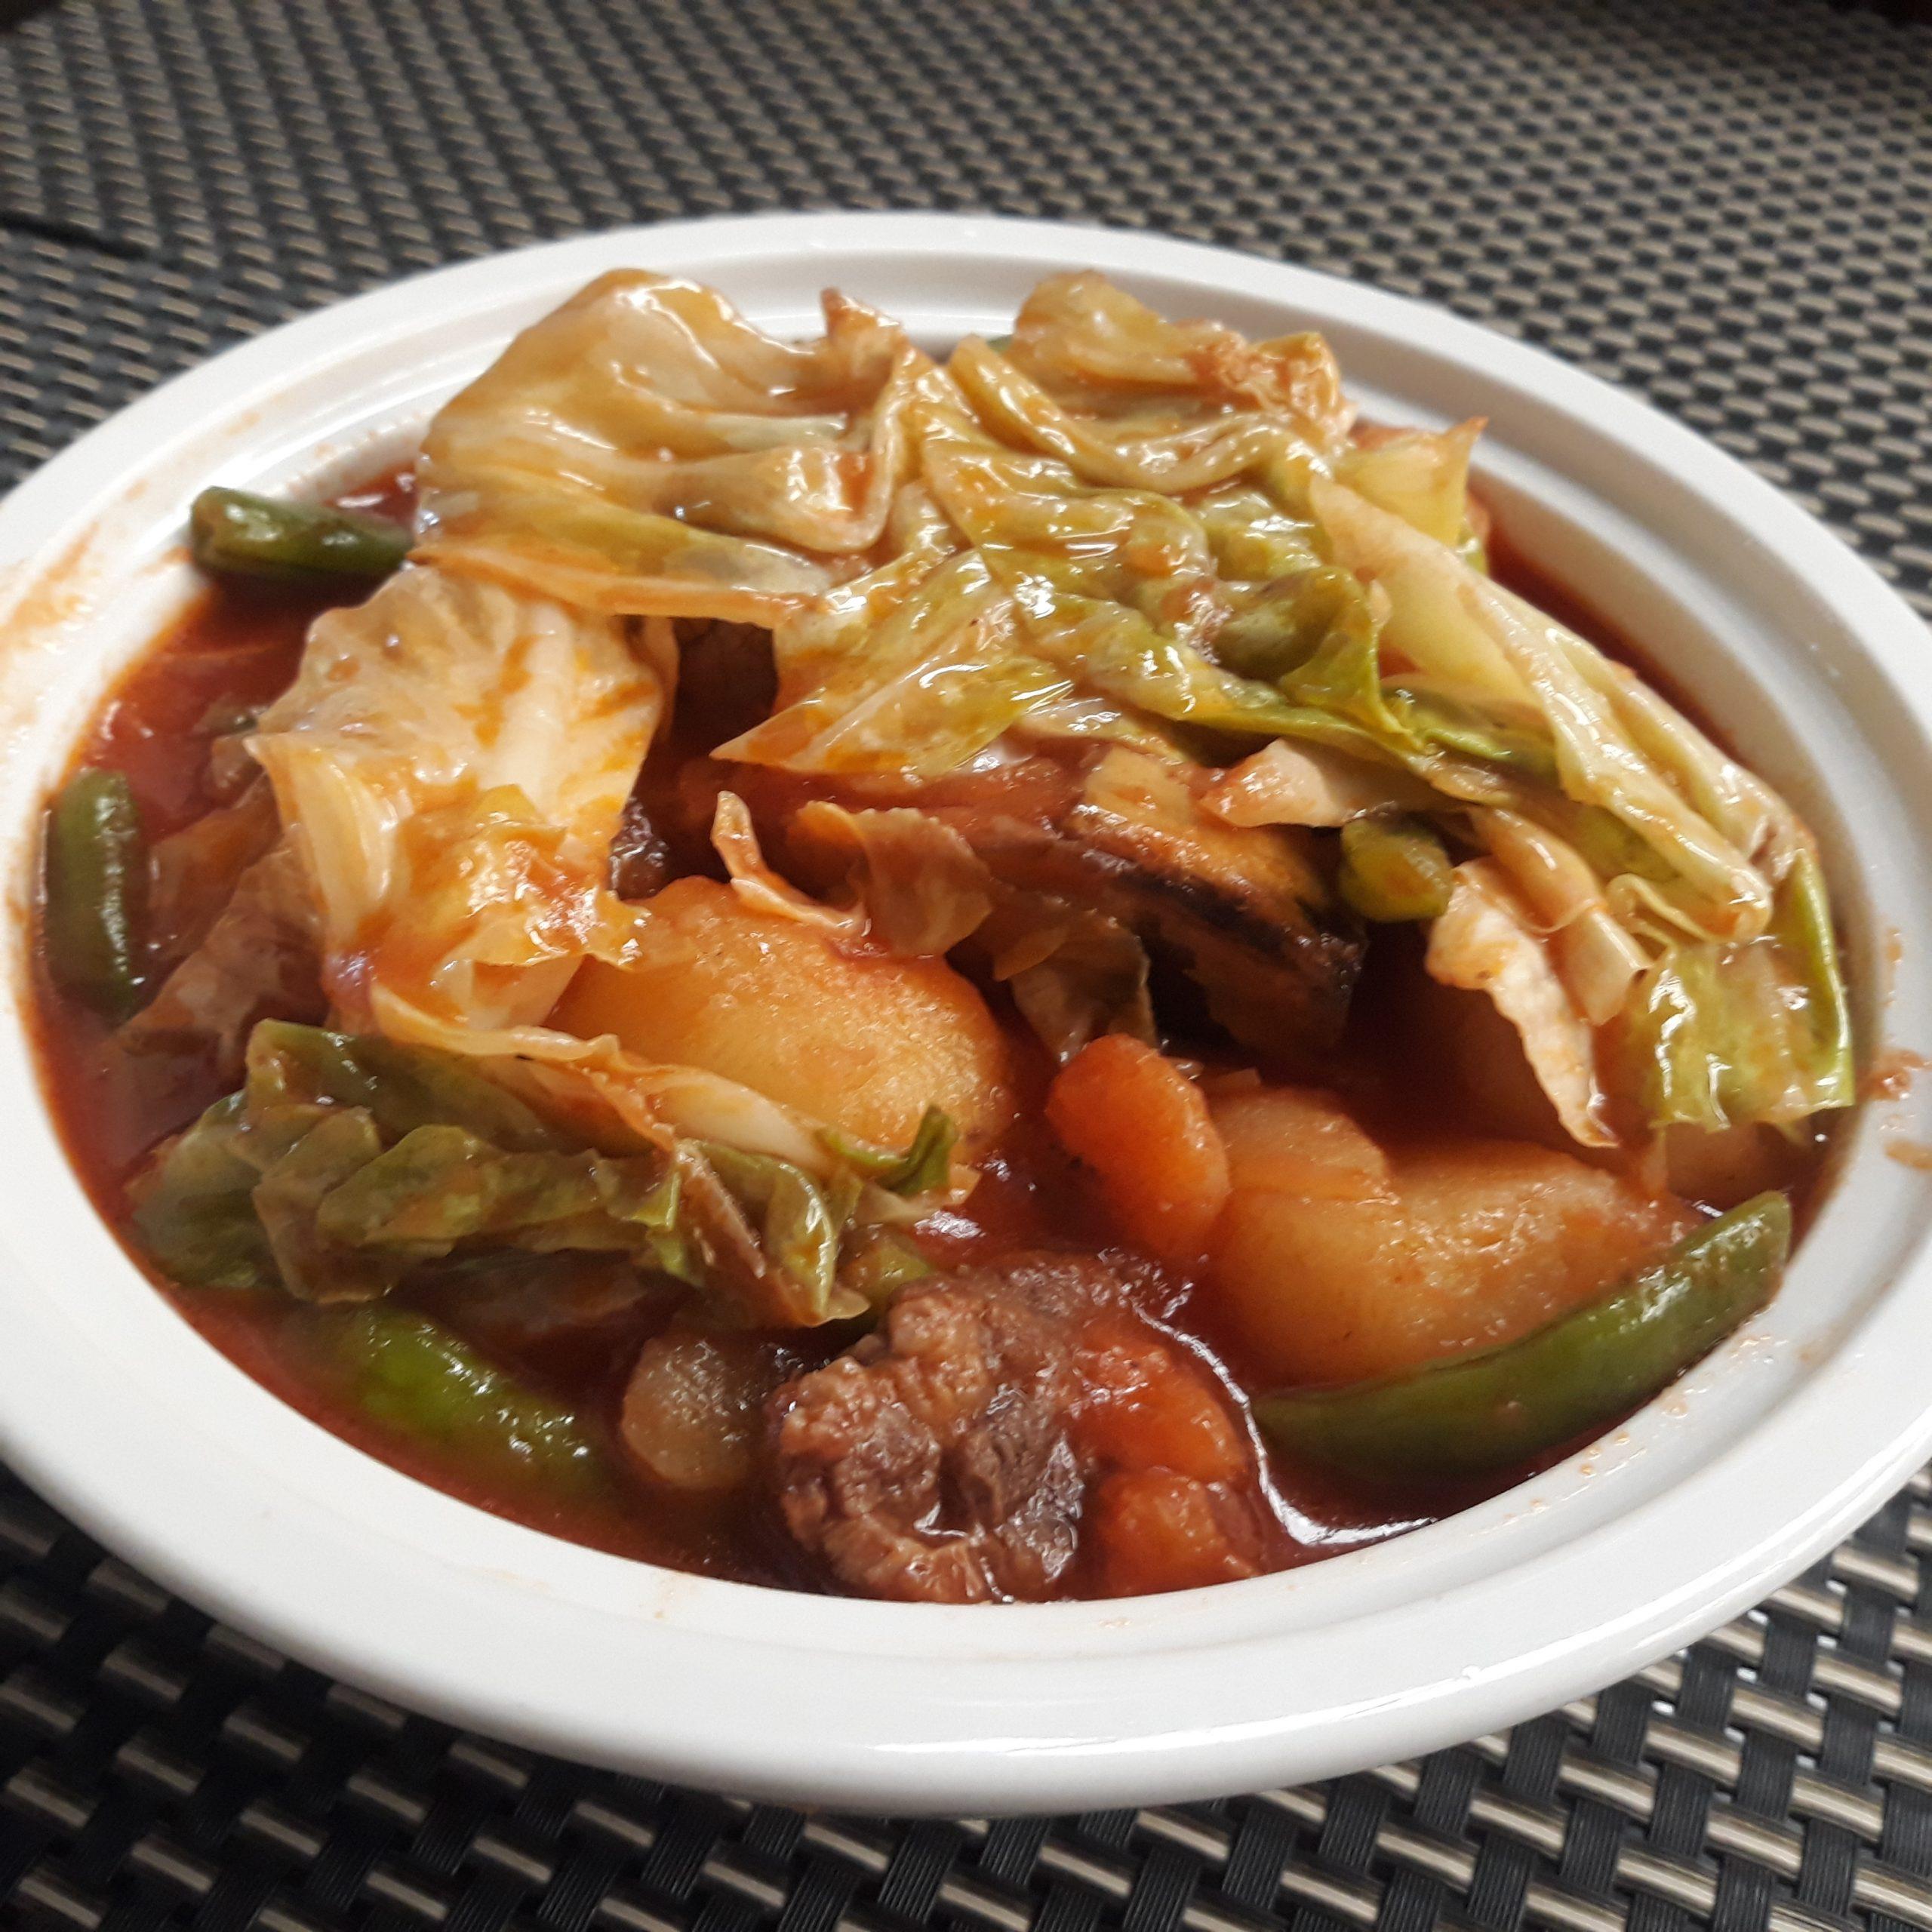 Pochero dish in a serving bowl.